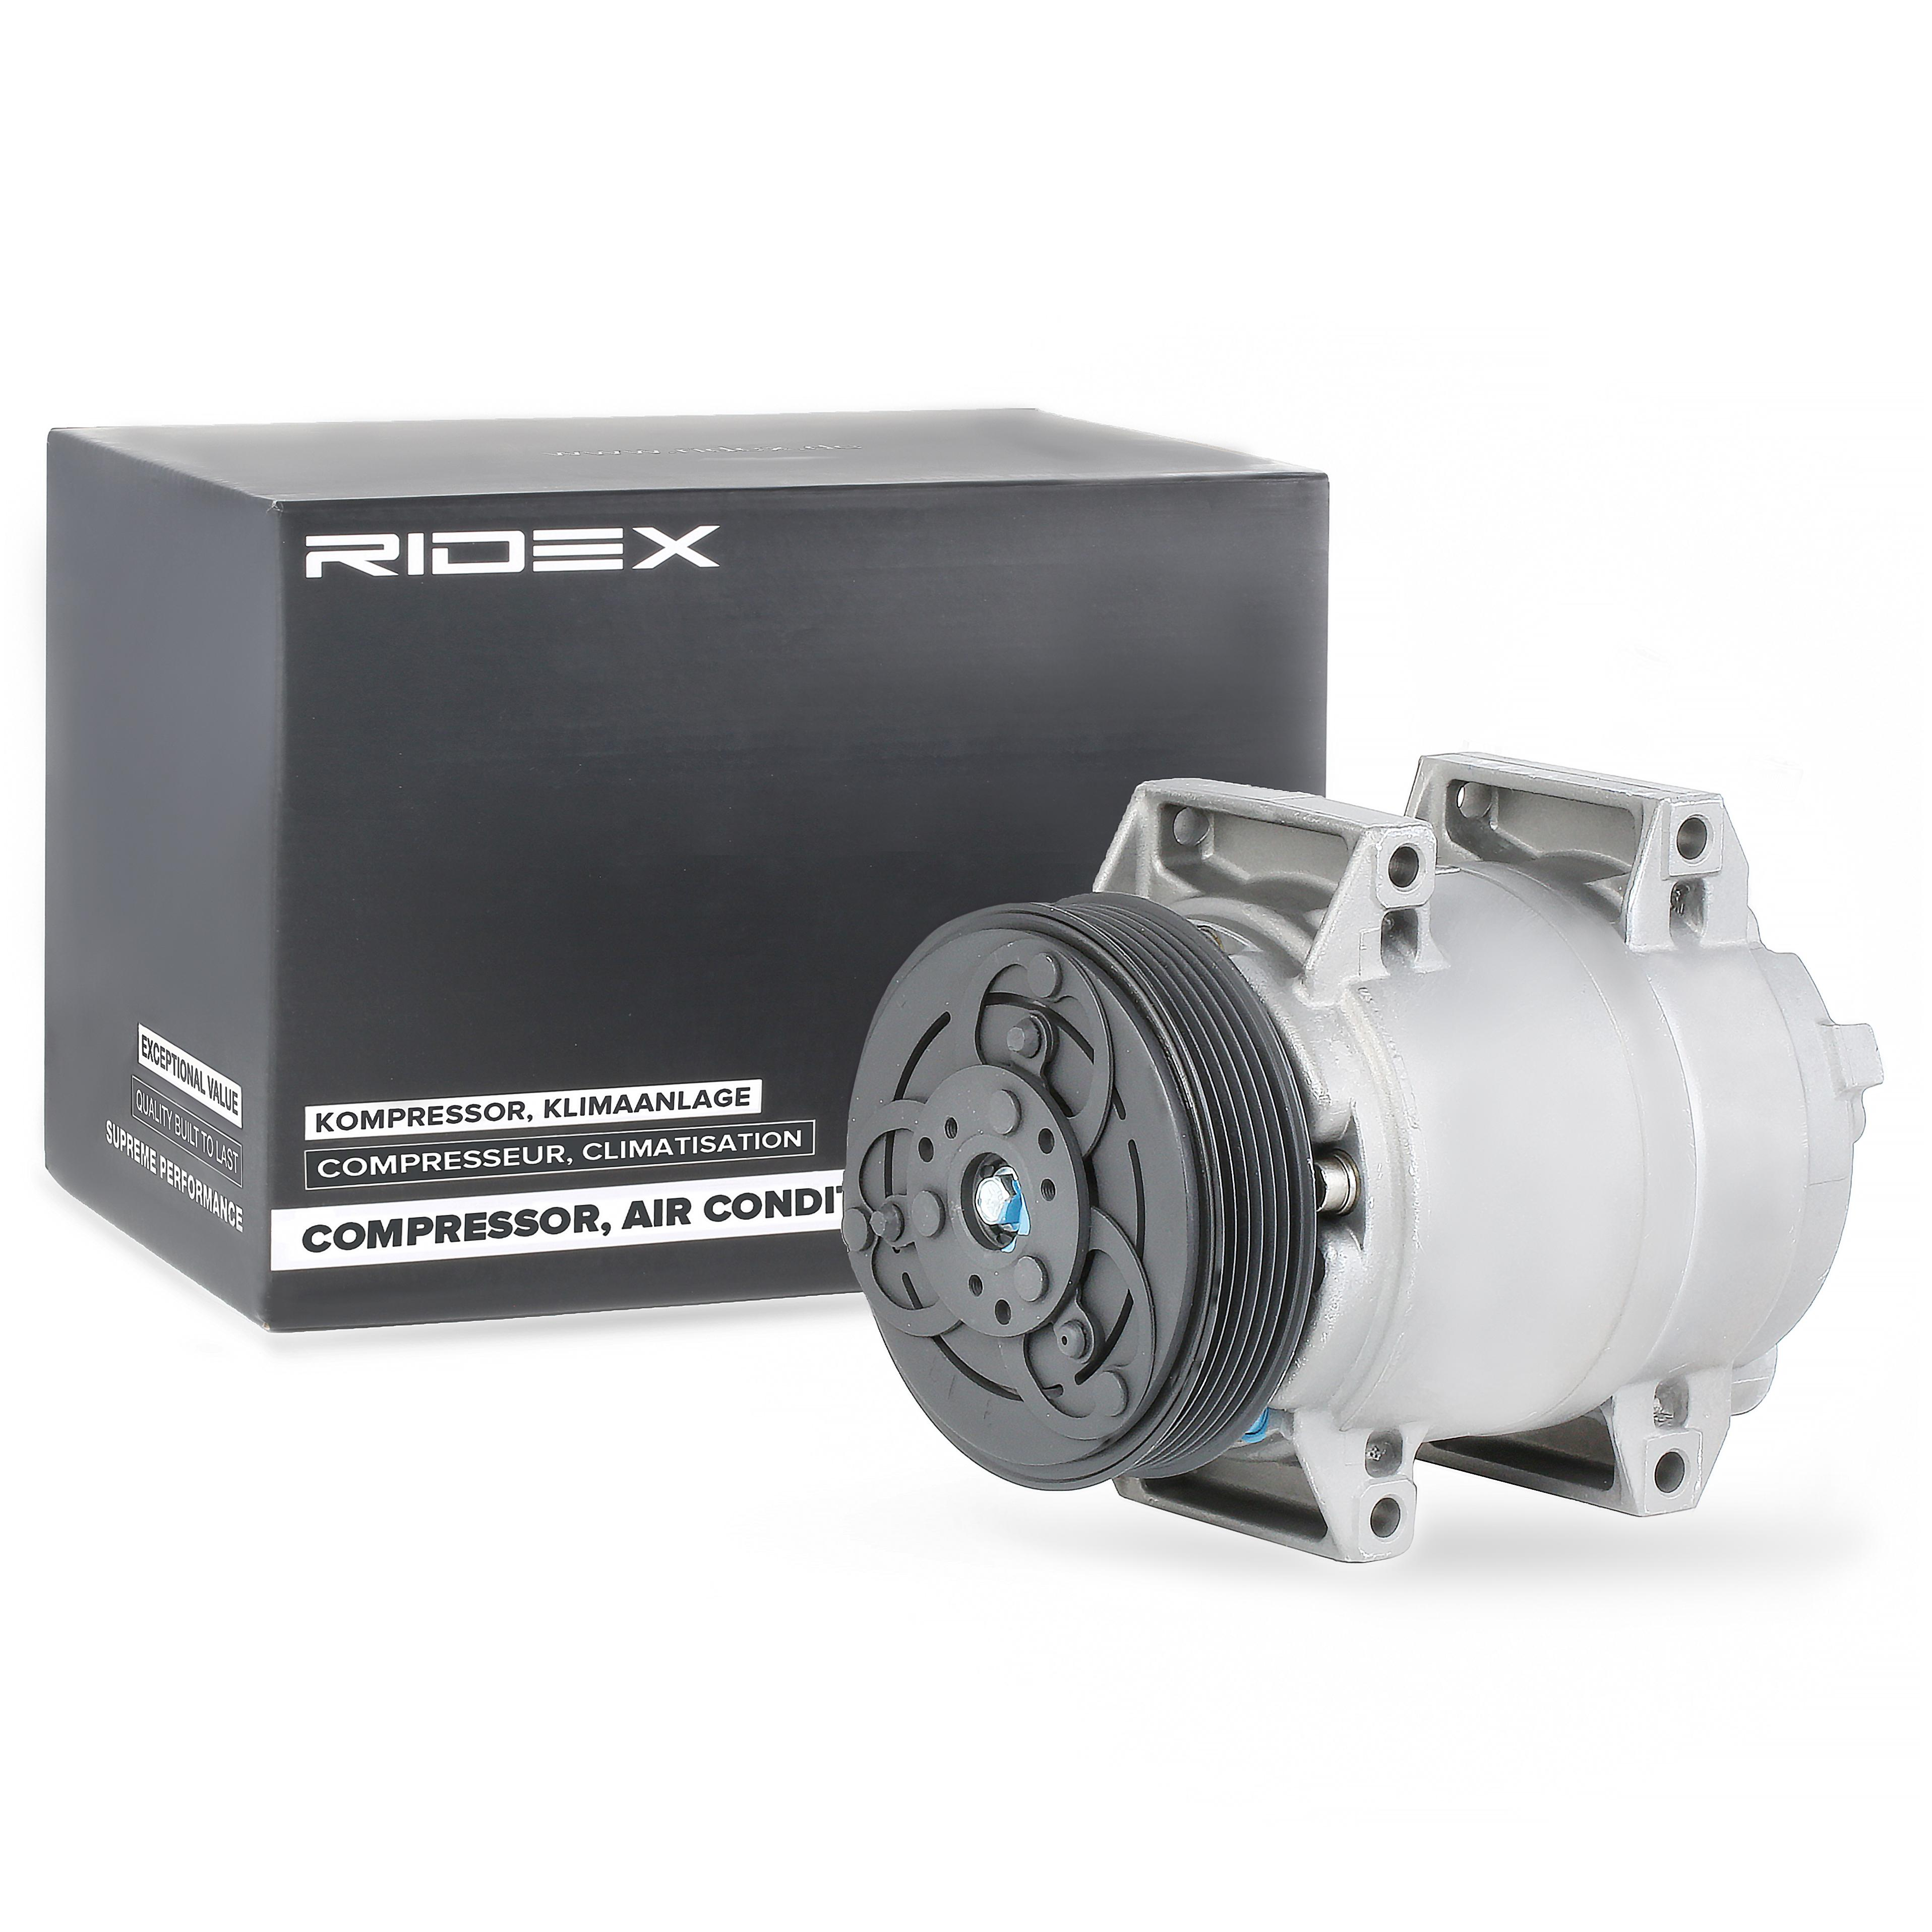 OE Original Kompressor Klimaanlage 447K0081 RIDEX